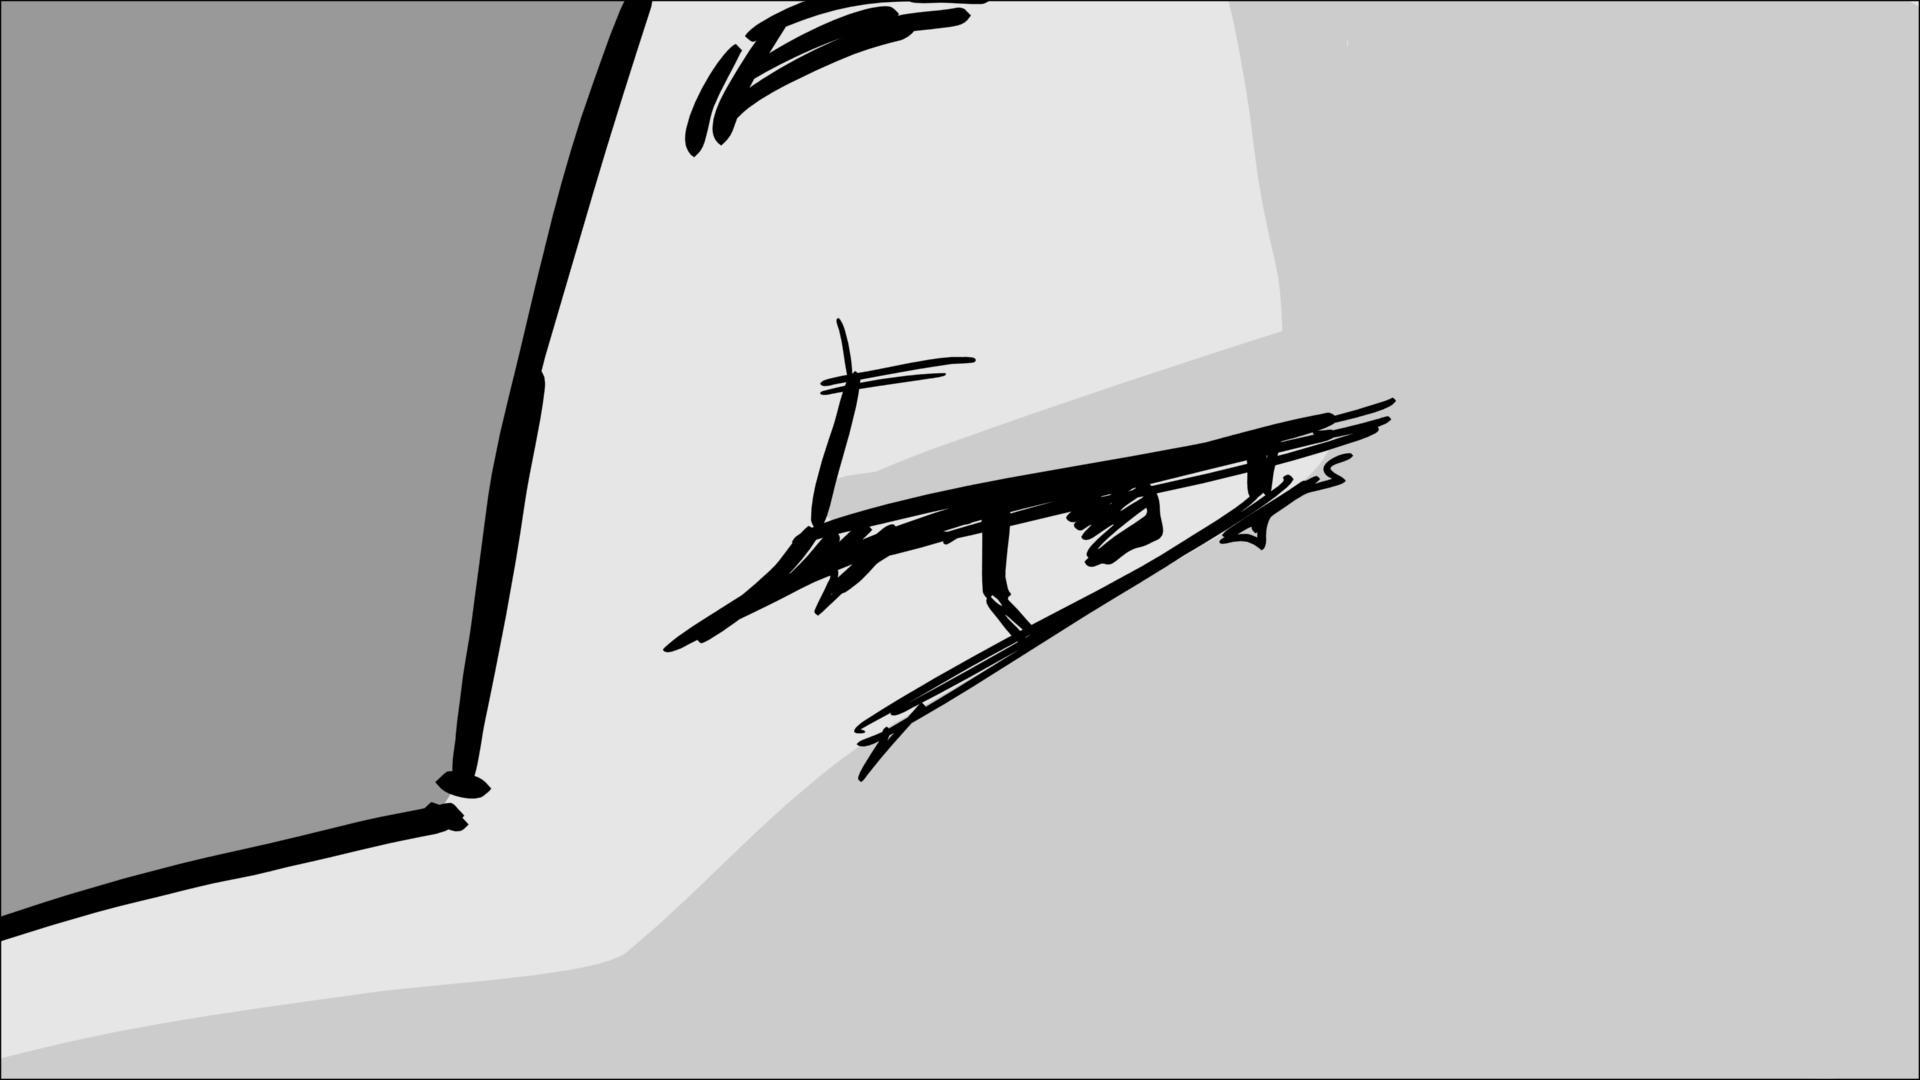 Blades of Furry-000033-01.jpg